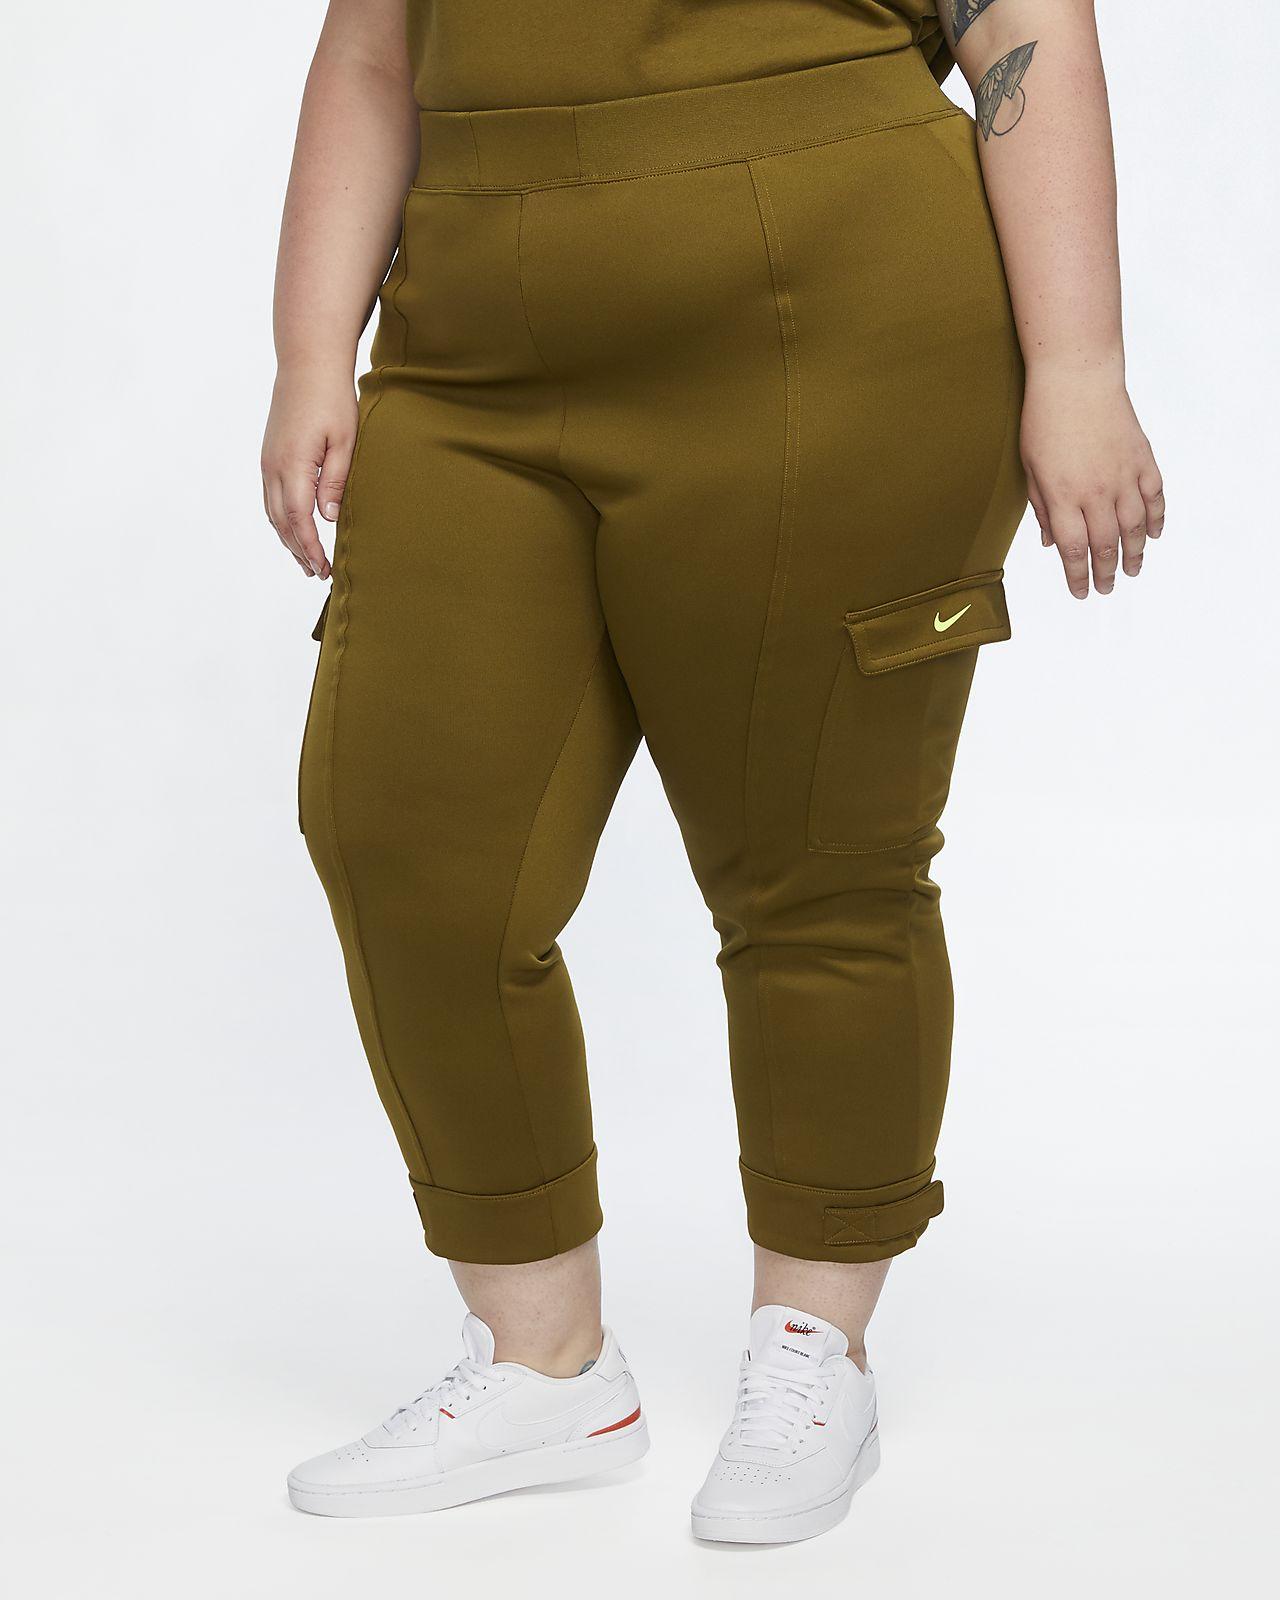 Nike Sportswear Swoosh polystrikket bukse til dame (Plus Size)